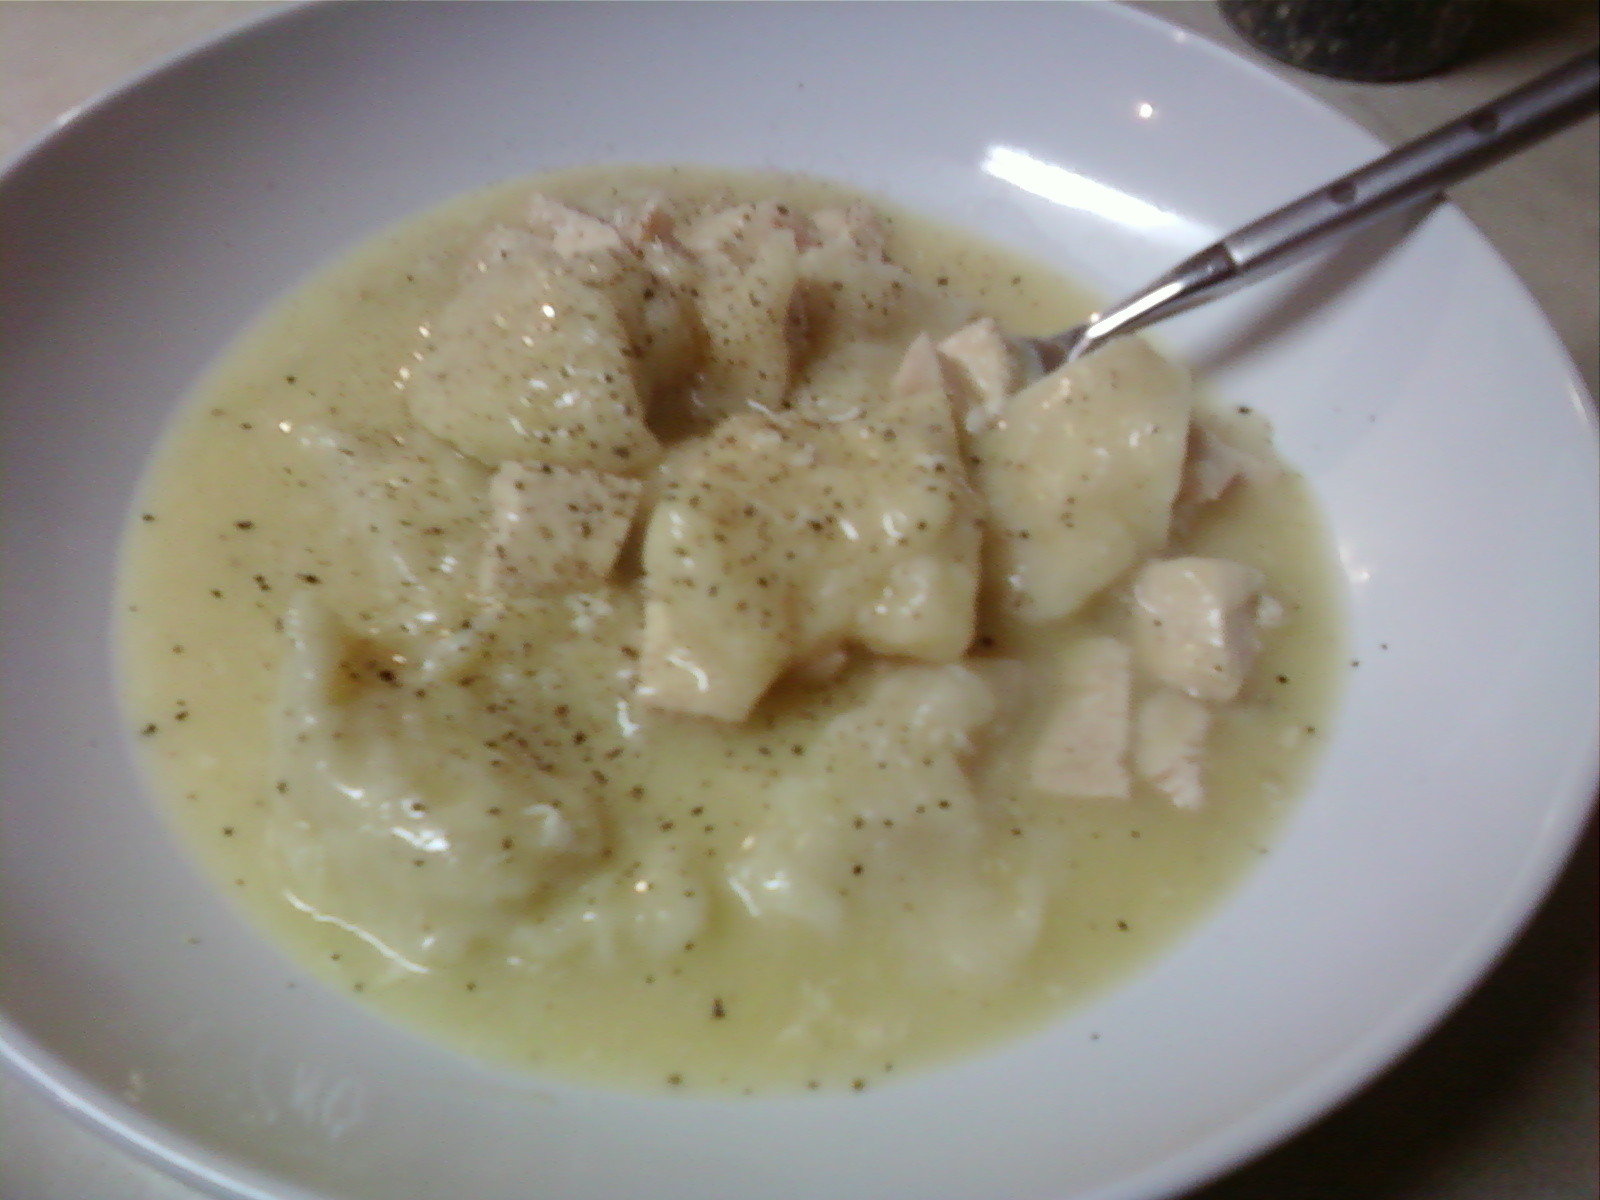 Kerri S Texas Kitchen February 2011